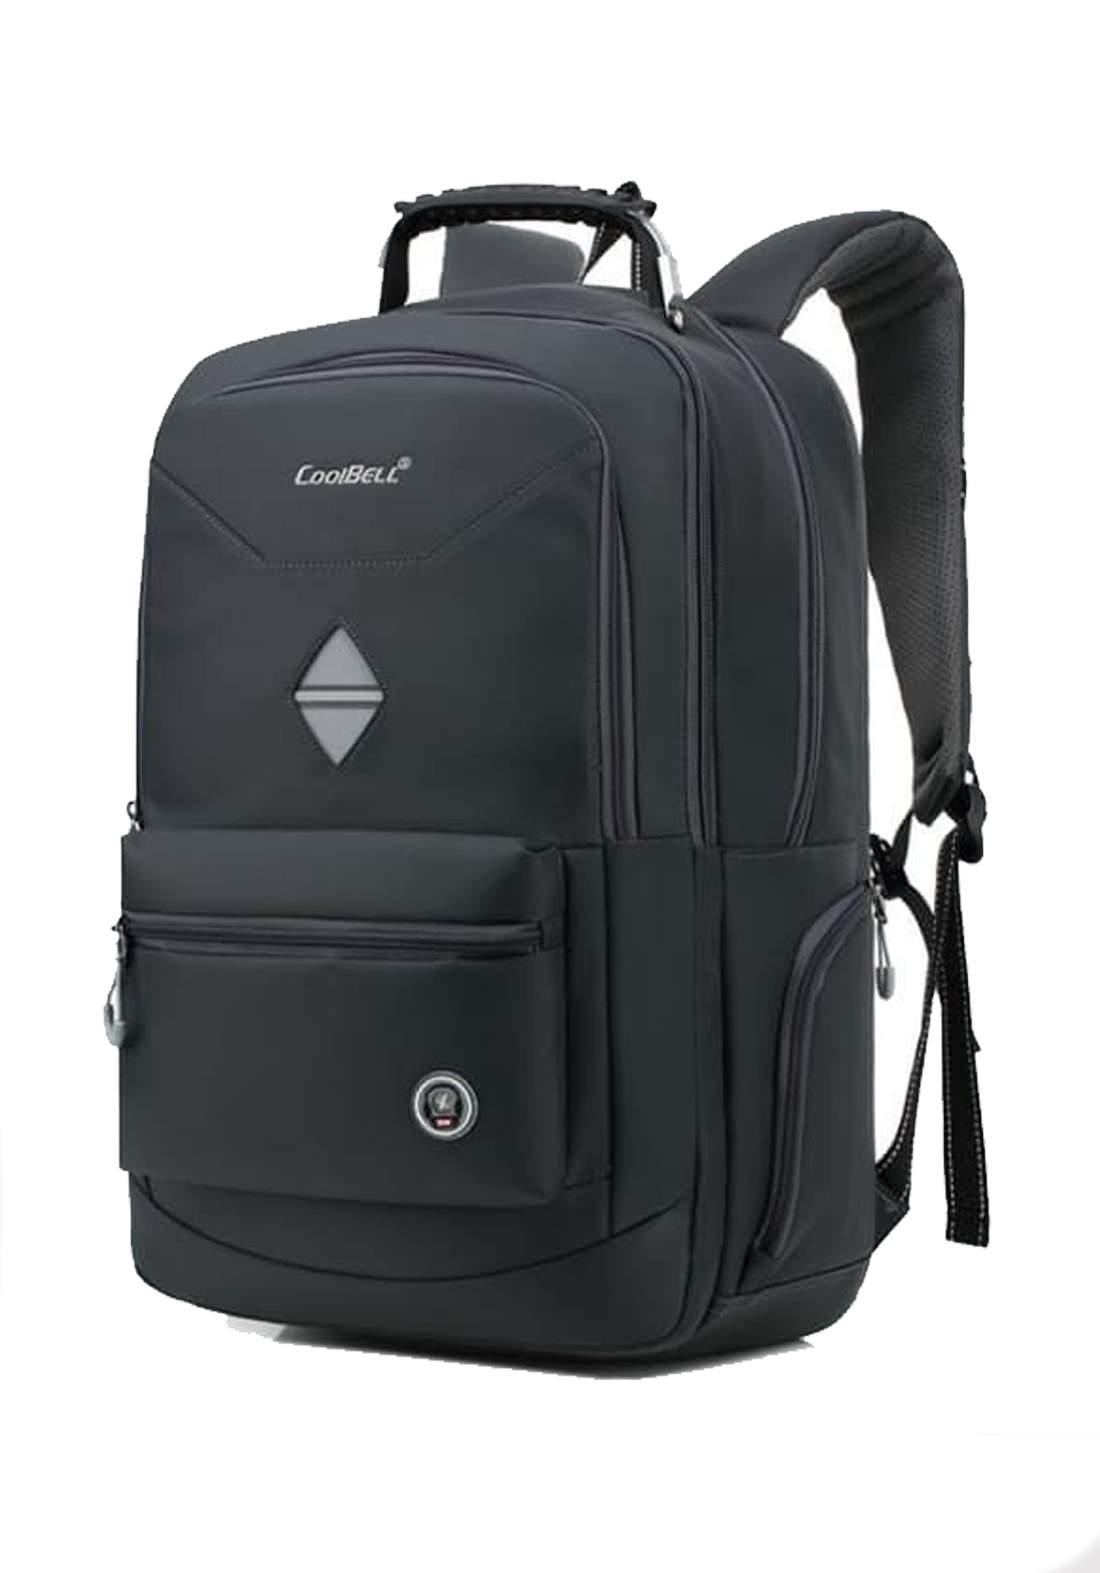 CollBell 5508 Laptop Bag-Grey حقيبة لابتوب